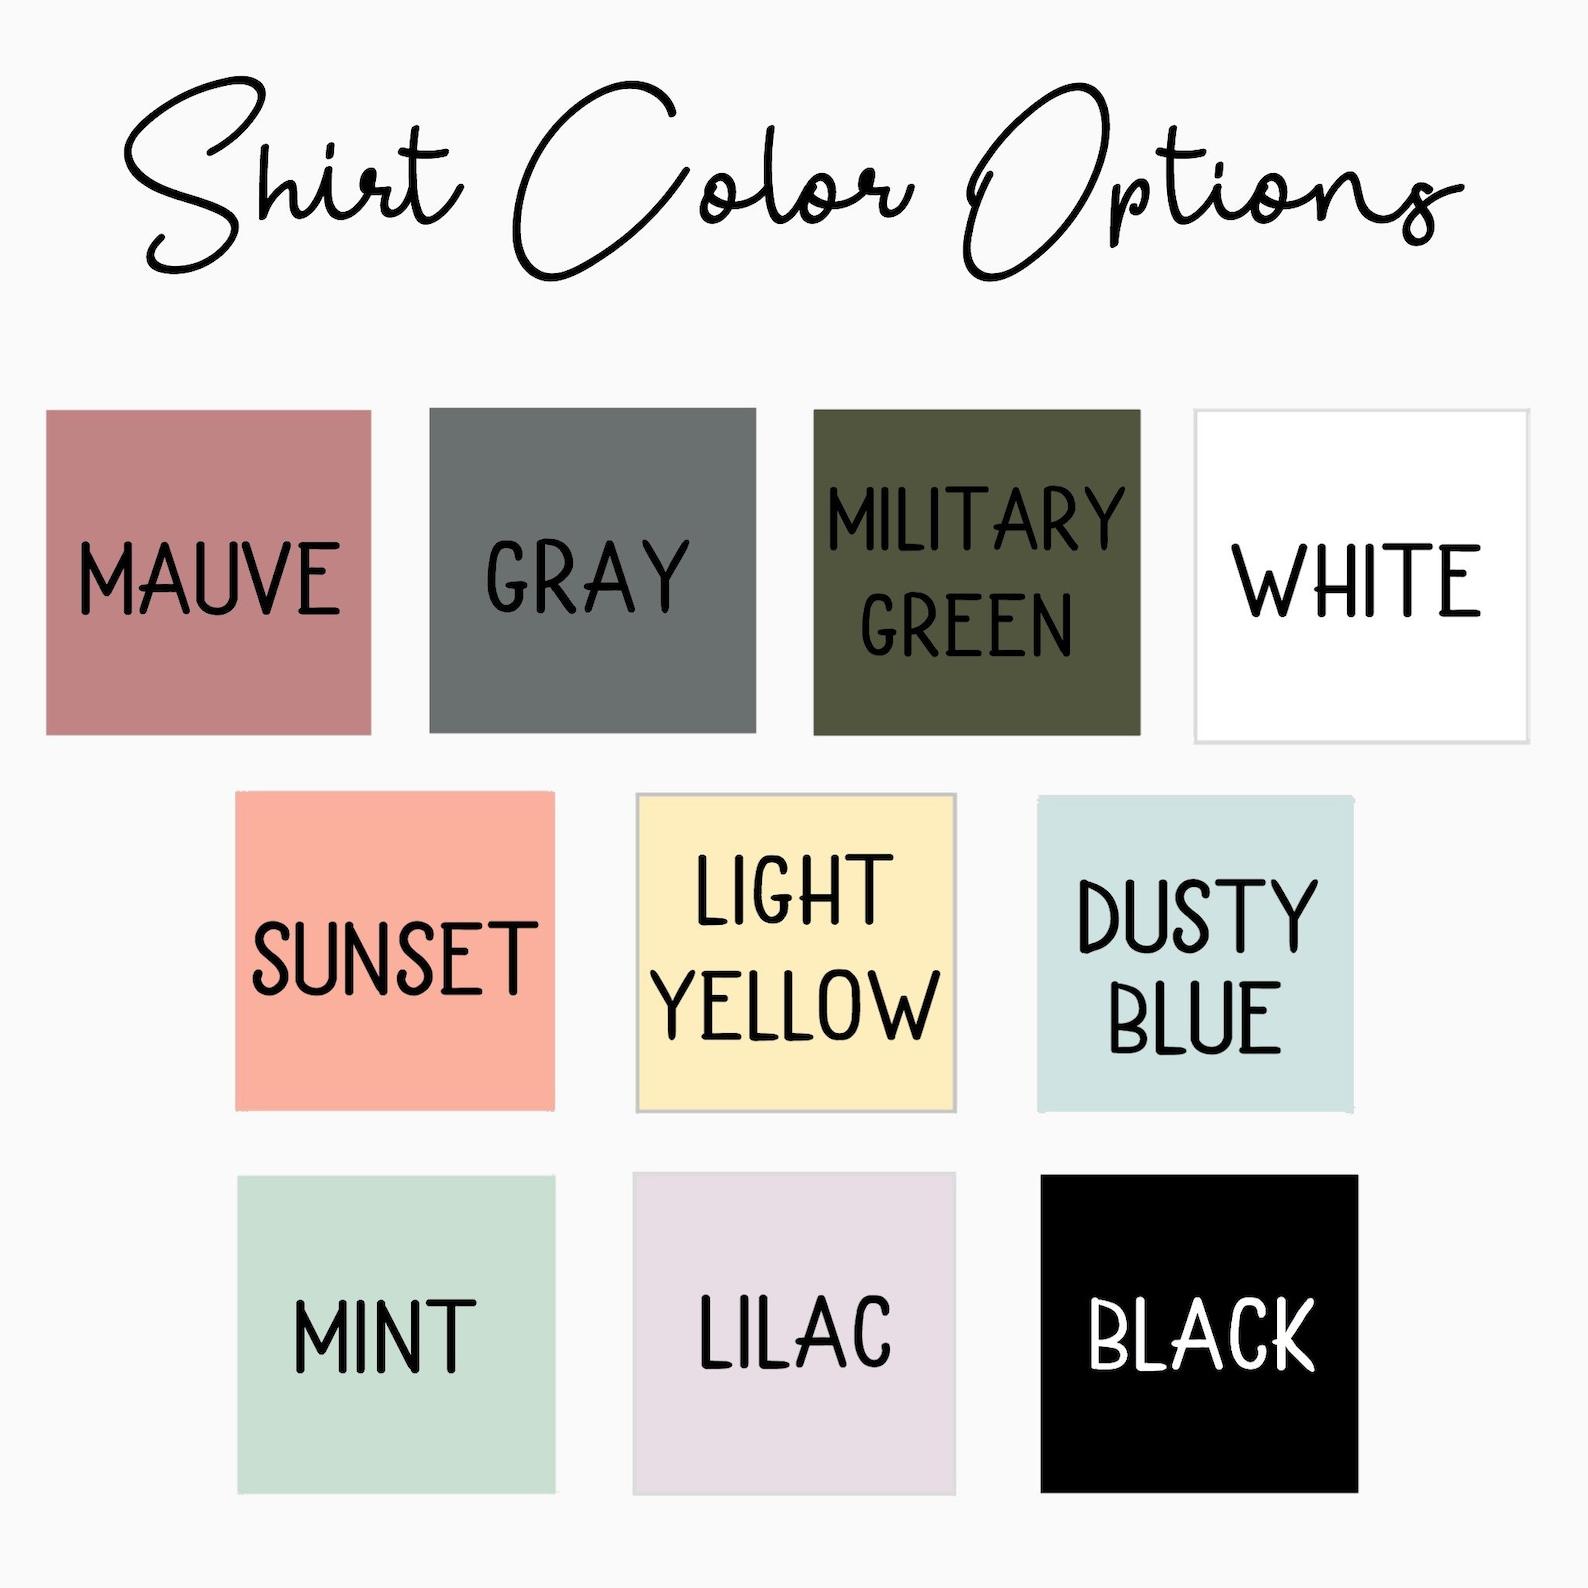 ballet shirt, ballerina tshirt, dance shirt, dance gift, ballet gift, dance teacher gift, ballet tops, embroidered tee, pointe s